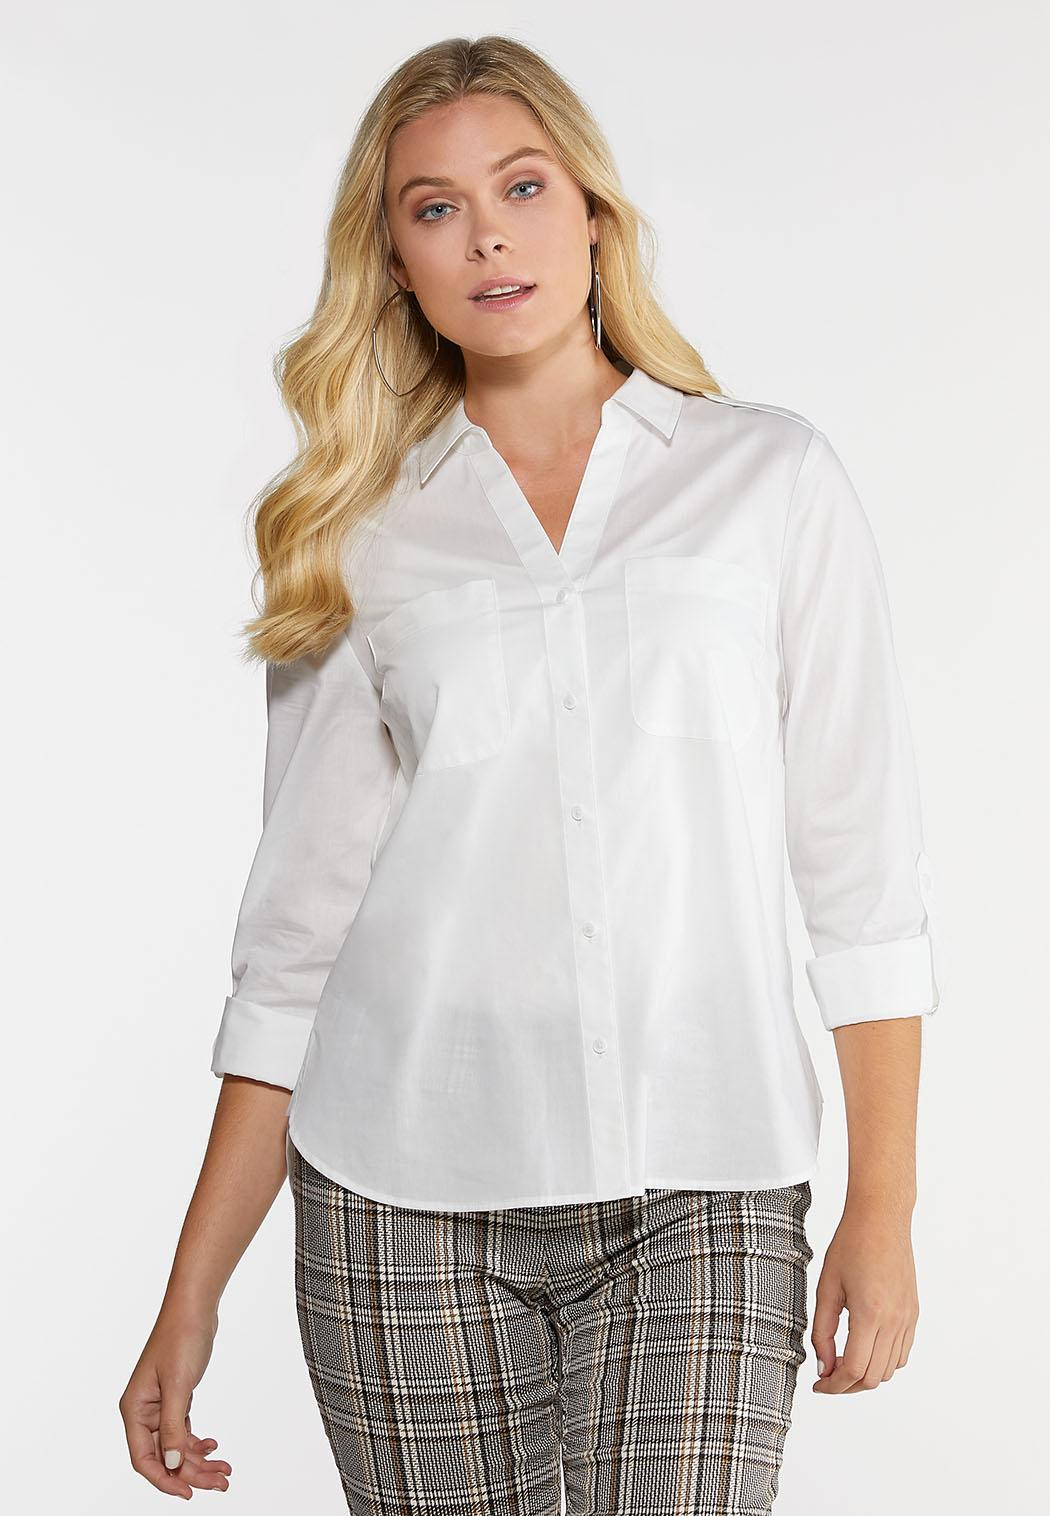 White Button Down Shirt Shirts & Amp ; Blouses Cato Fashions